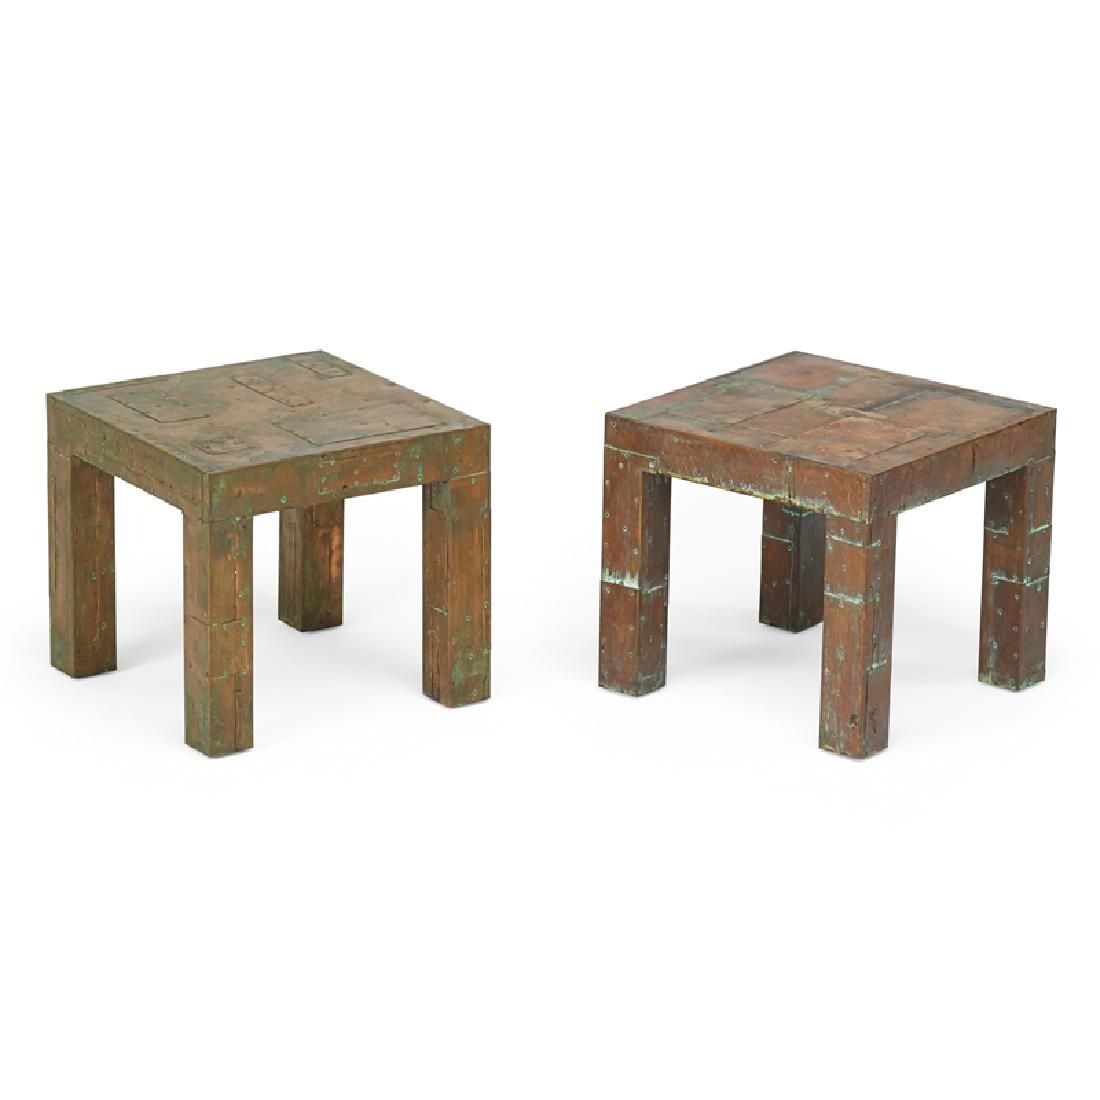 PAUL EVANS Pair of Patchwork side tables